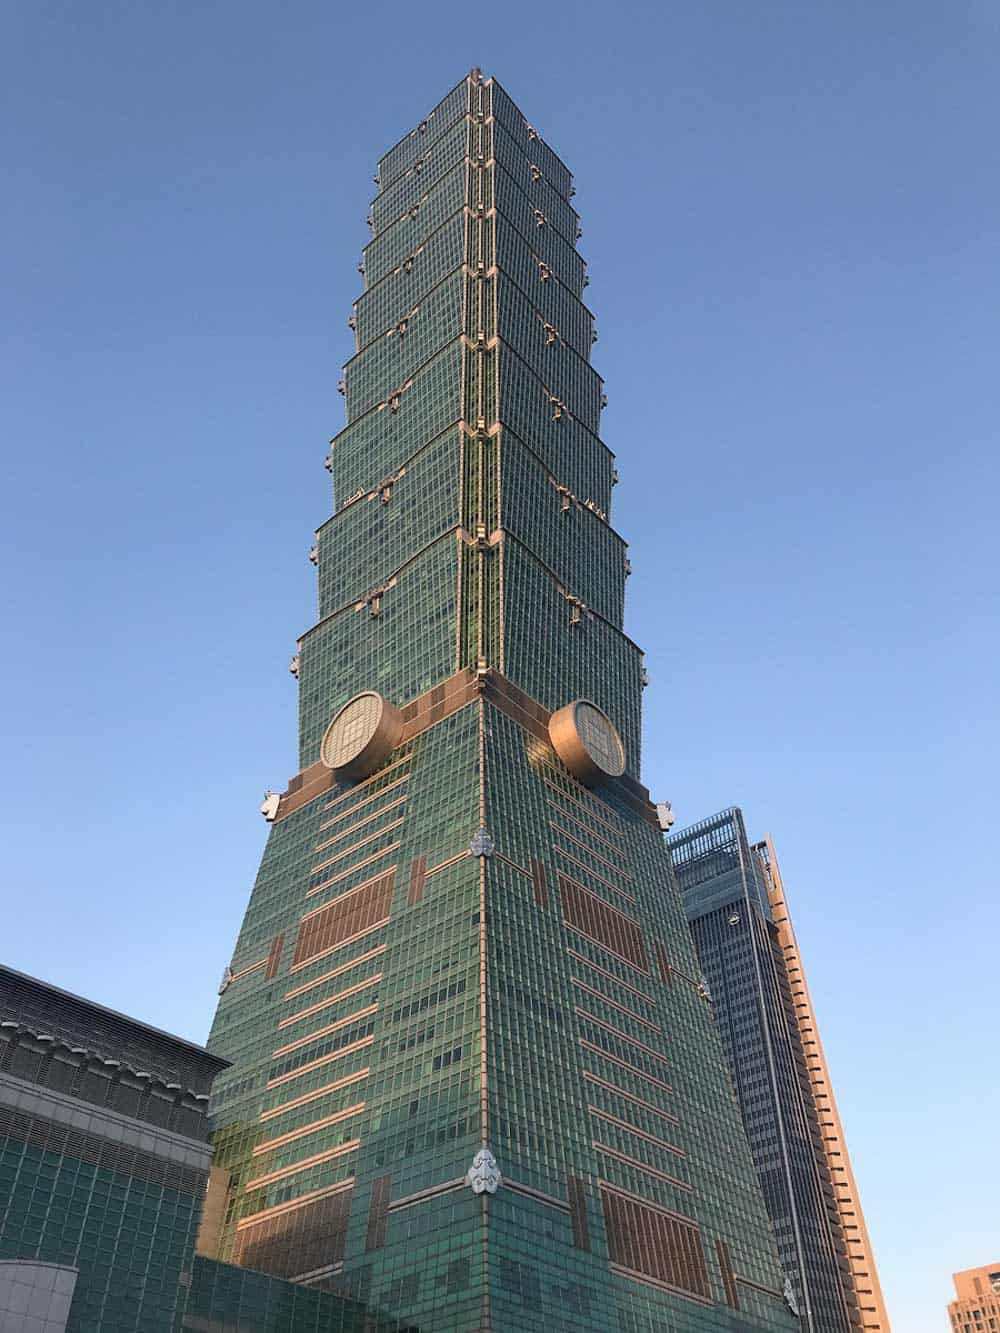 Taipei 101 a landmark of Taipei and Tawan